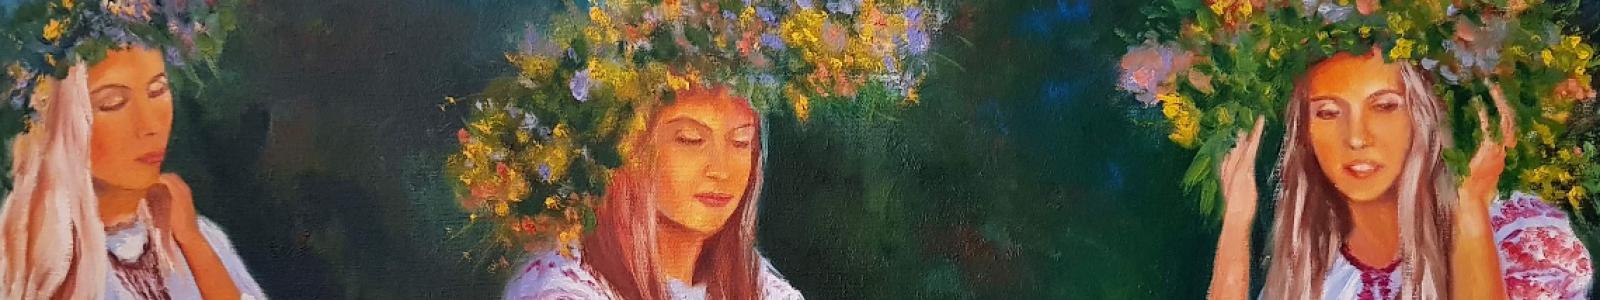 Gallery Painter Svetlana Grishkovec-Kiisky